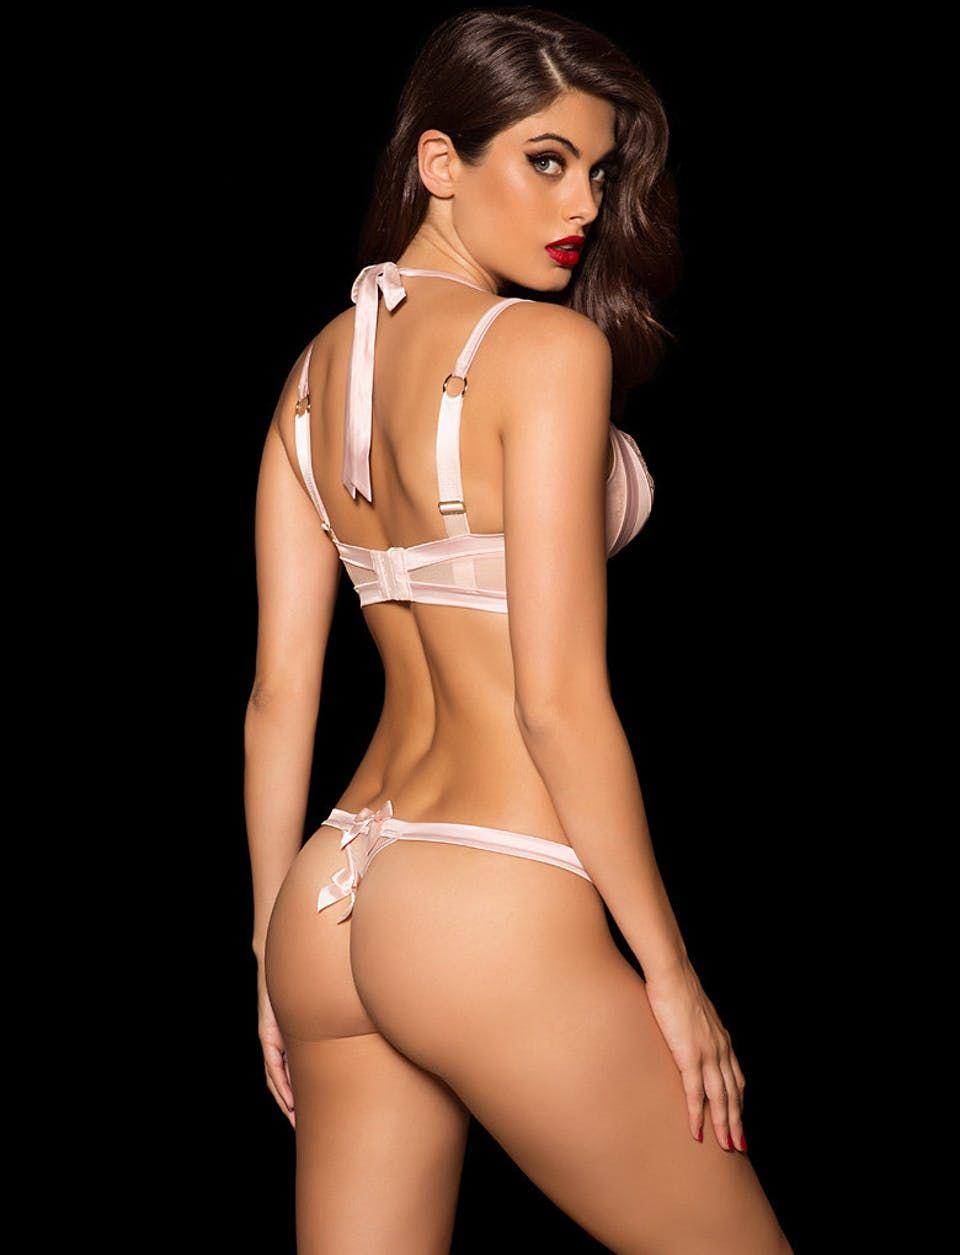 naked Panties Patrizia Pellegrino (12 photo) Pussy, Instagram, butt